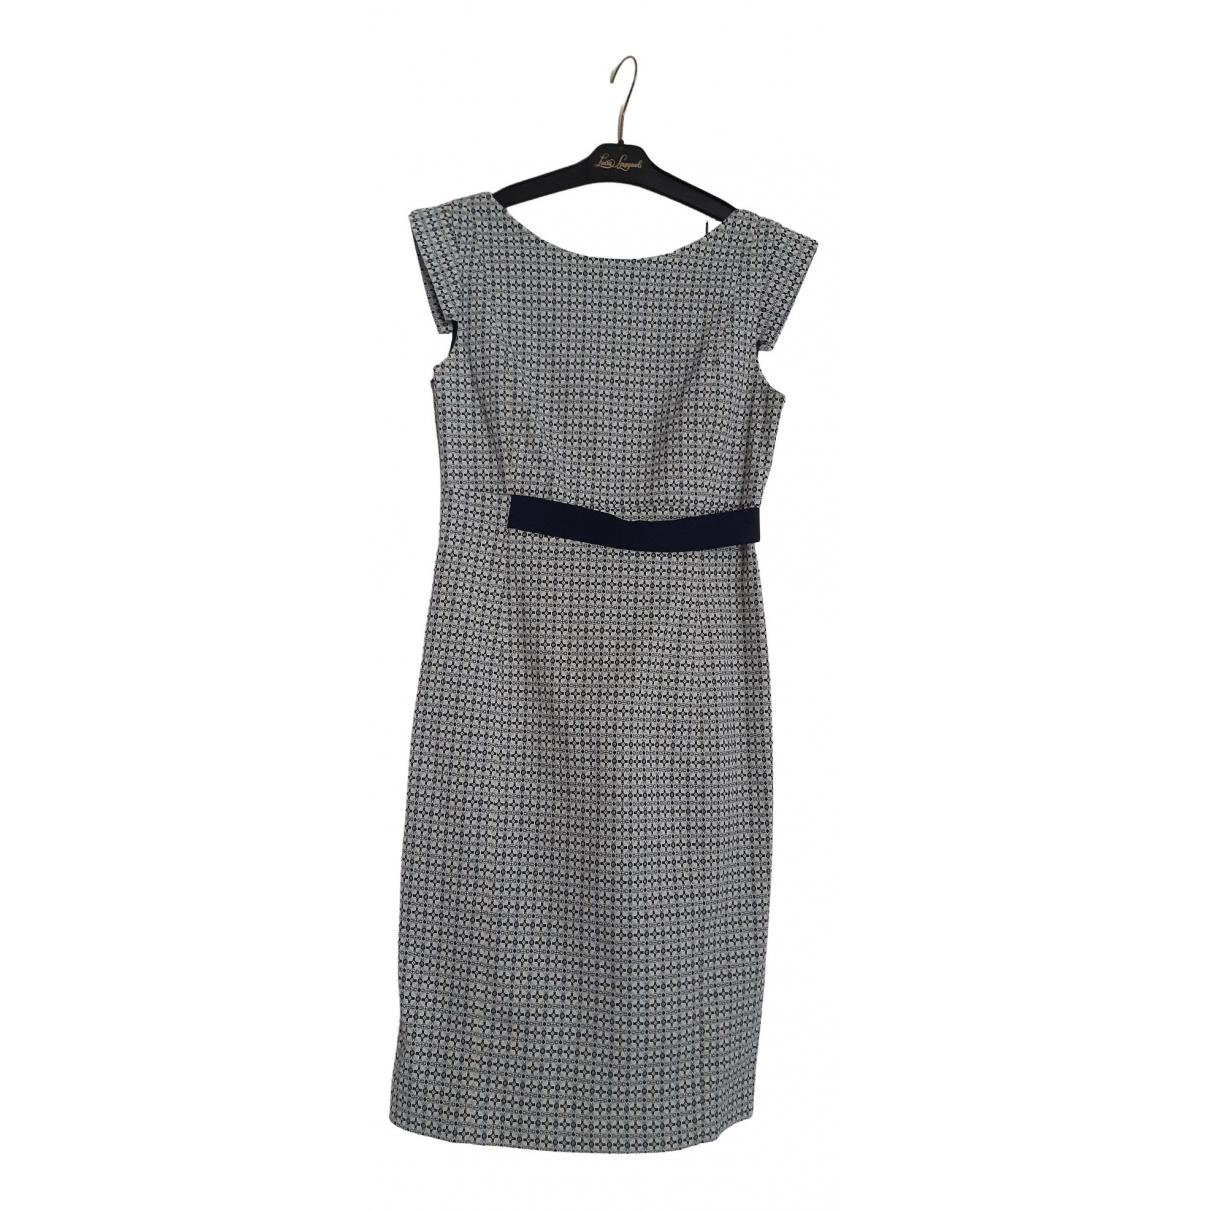 Max & Co - Robe   pour femme en coton - elasthane - multicolore